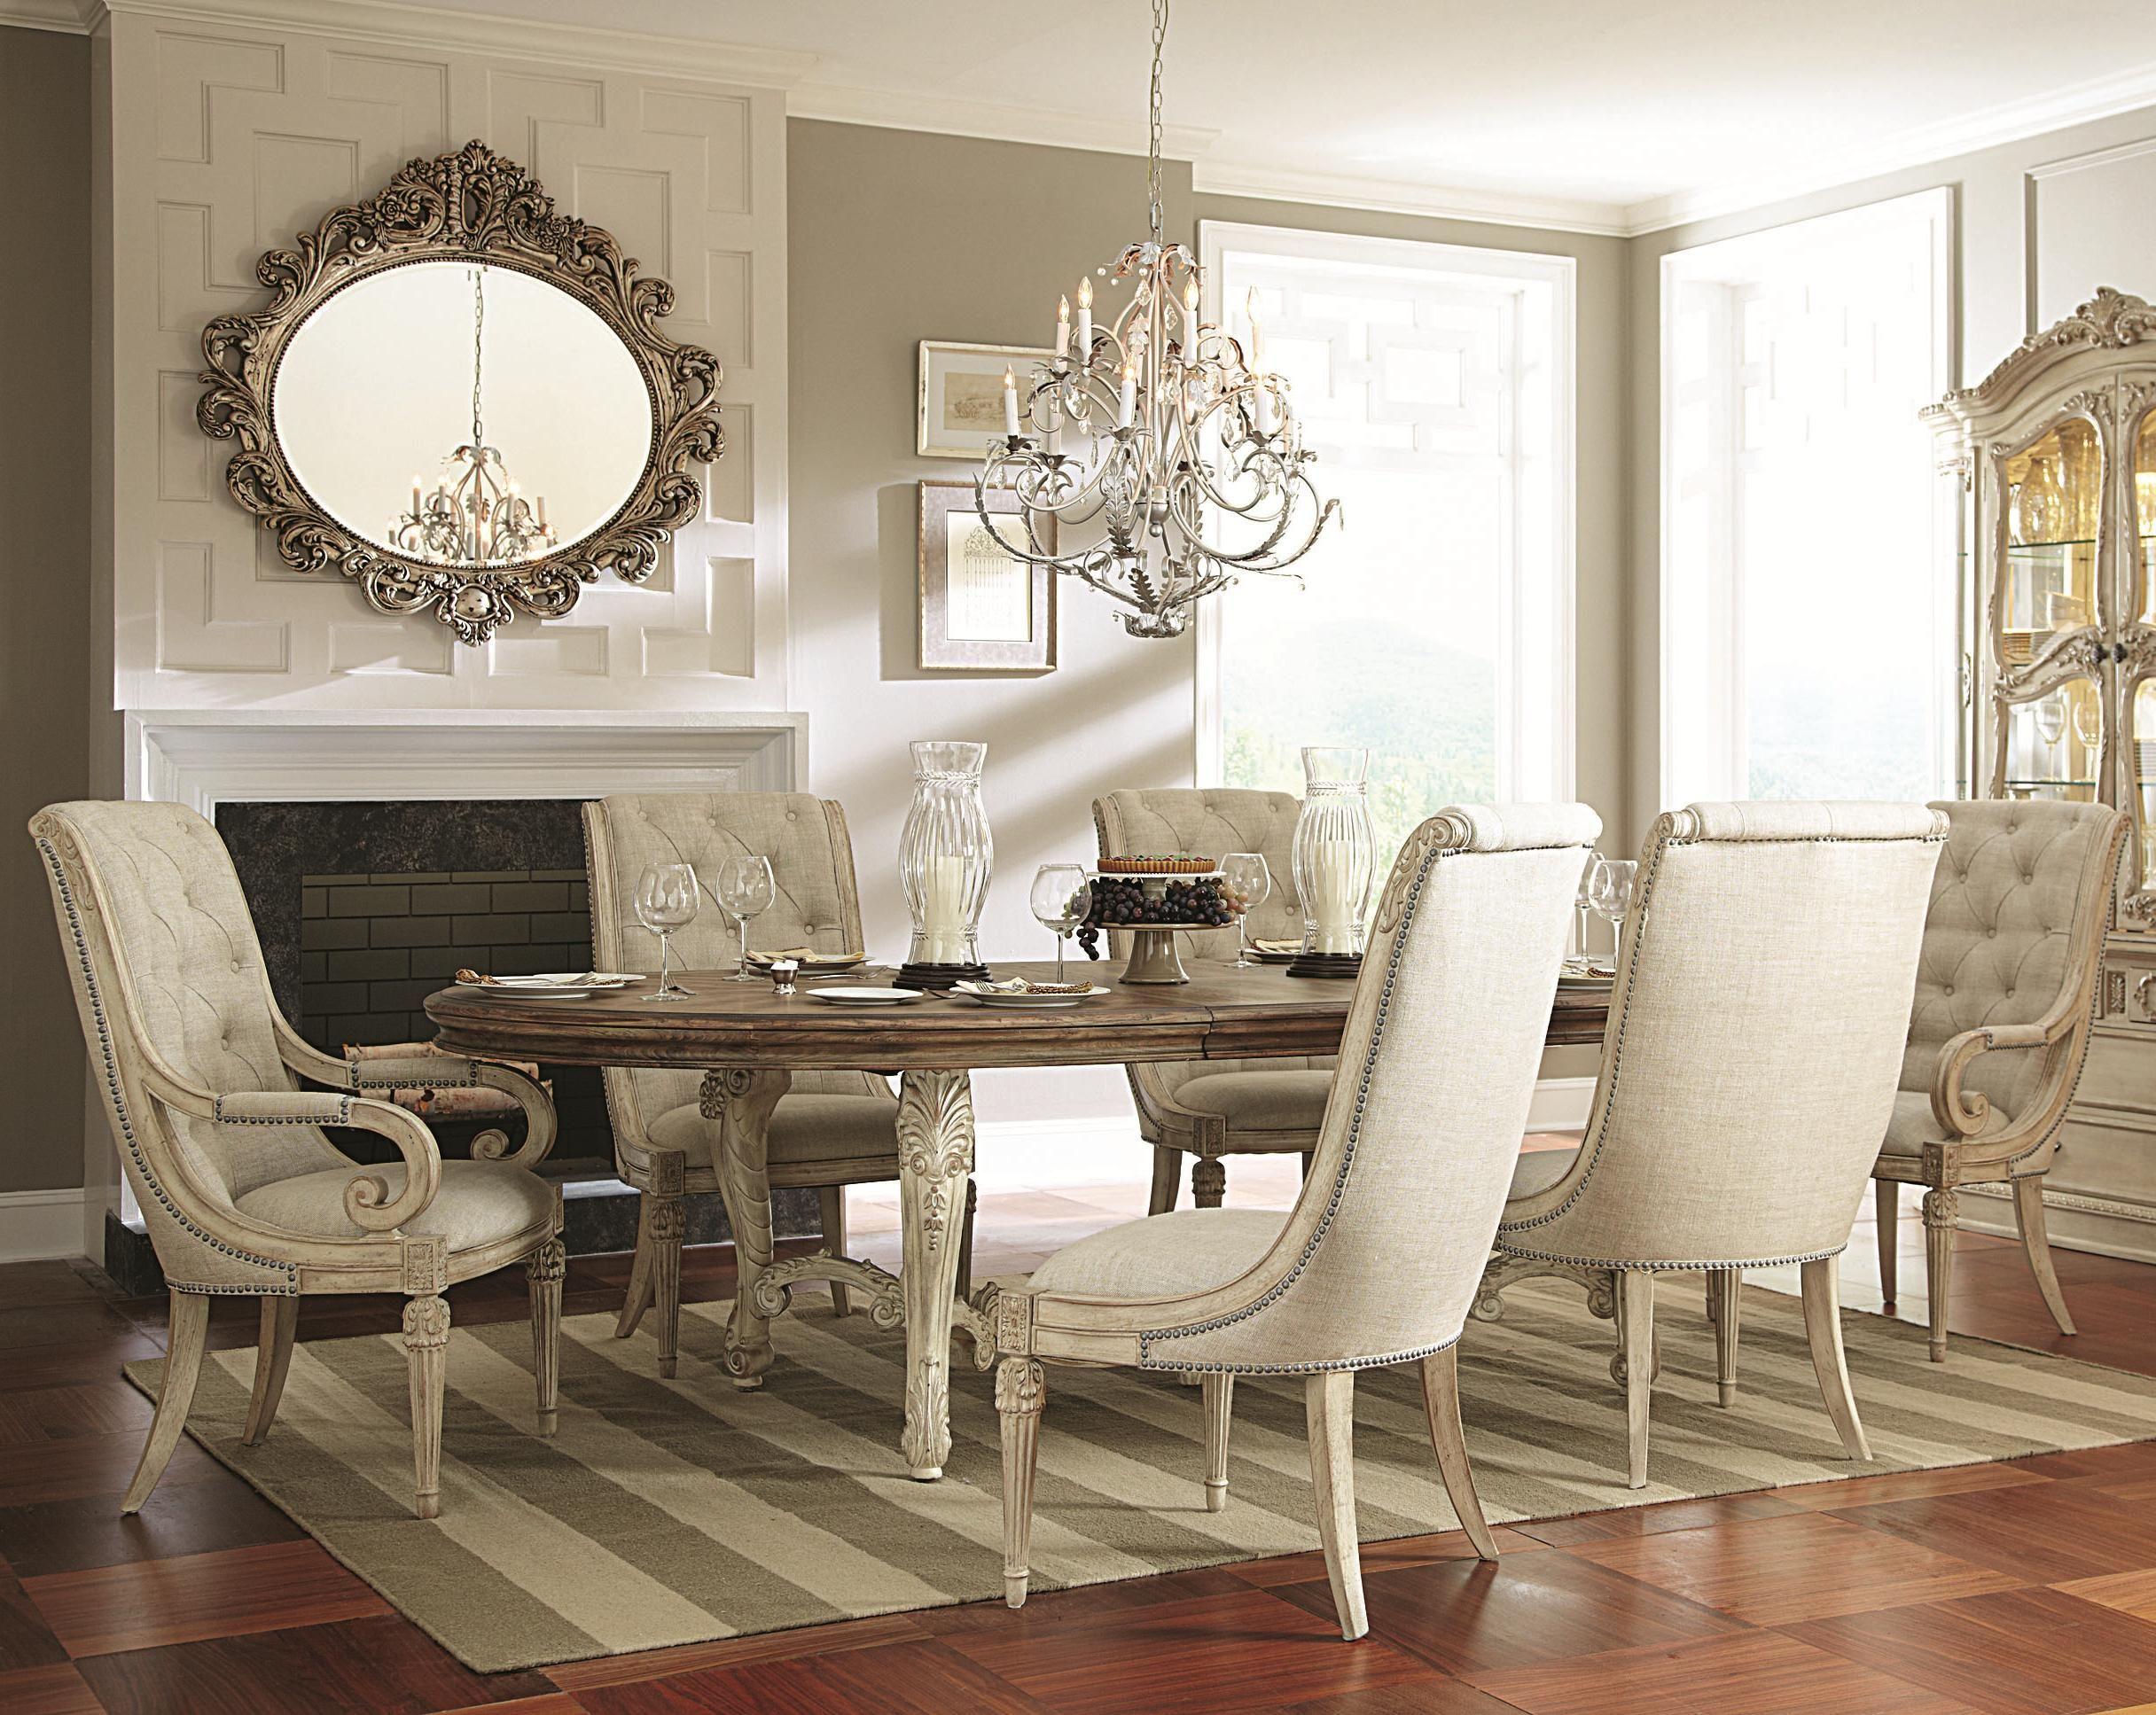 Vintage American Drew Dining Room Furniture